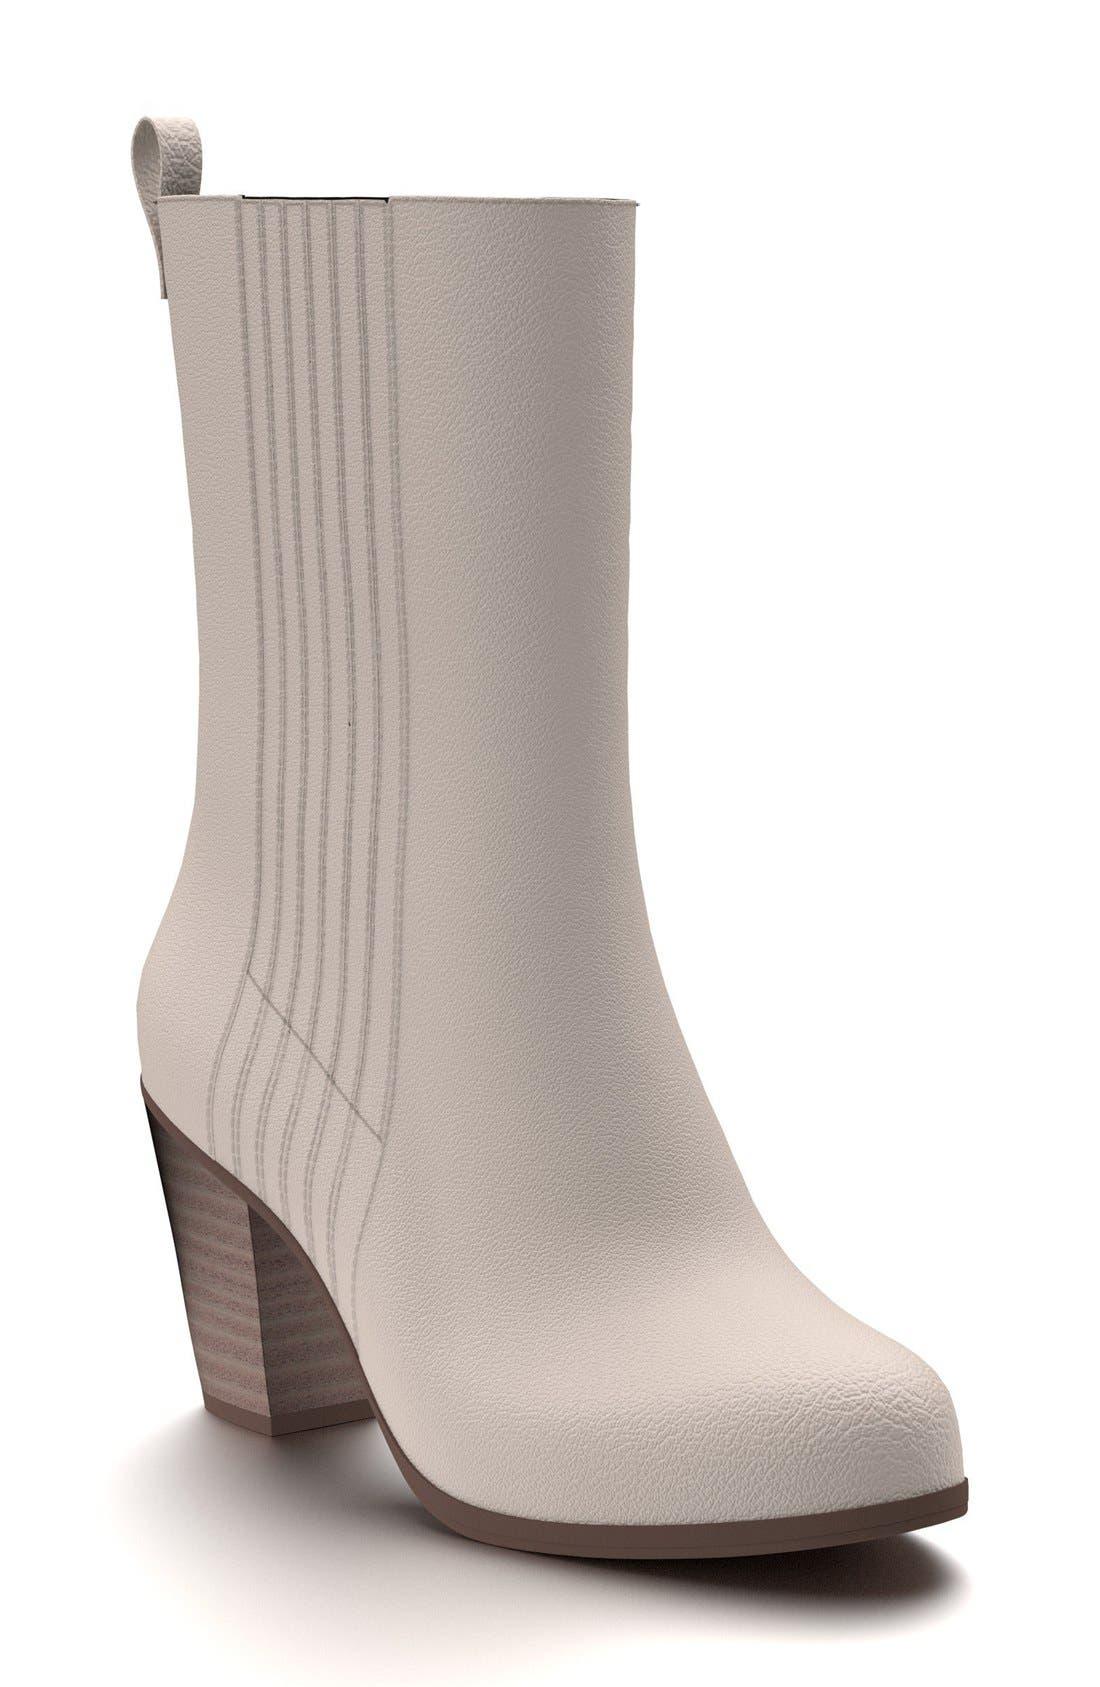 Shoes of Prey Mid Calf Boot (Women)